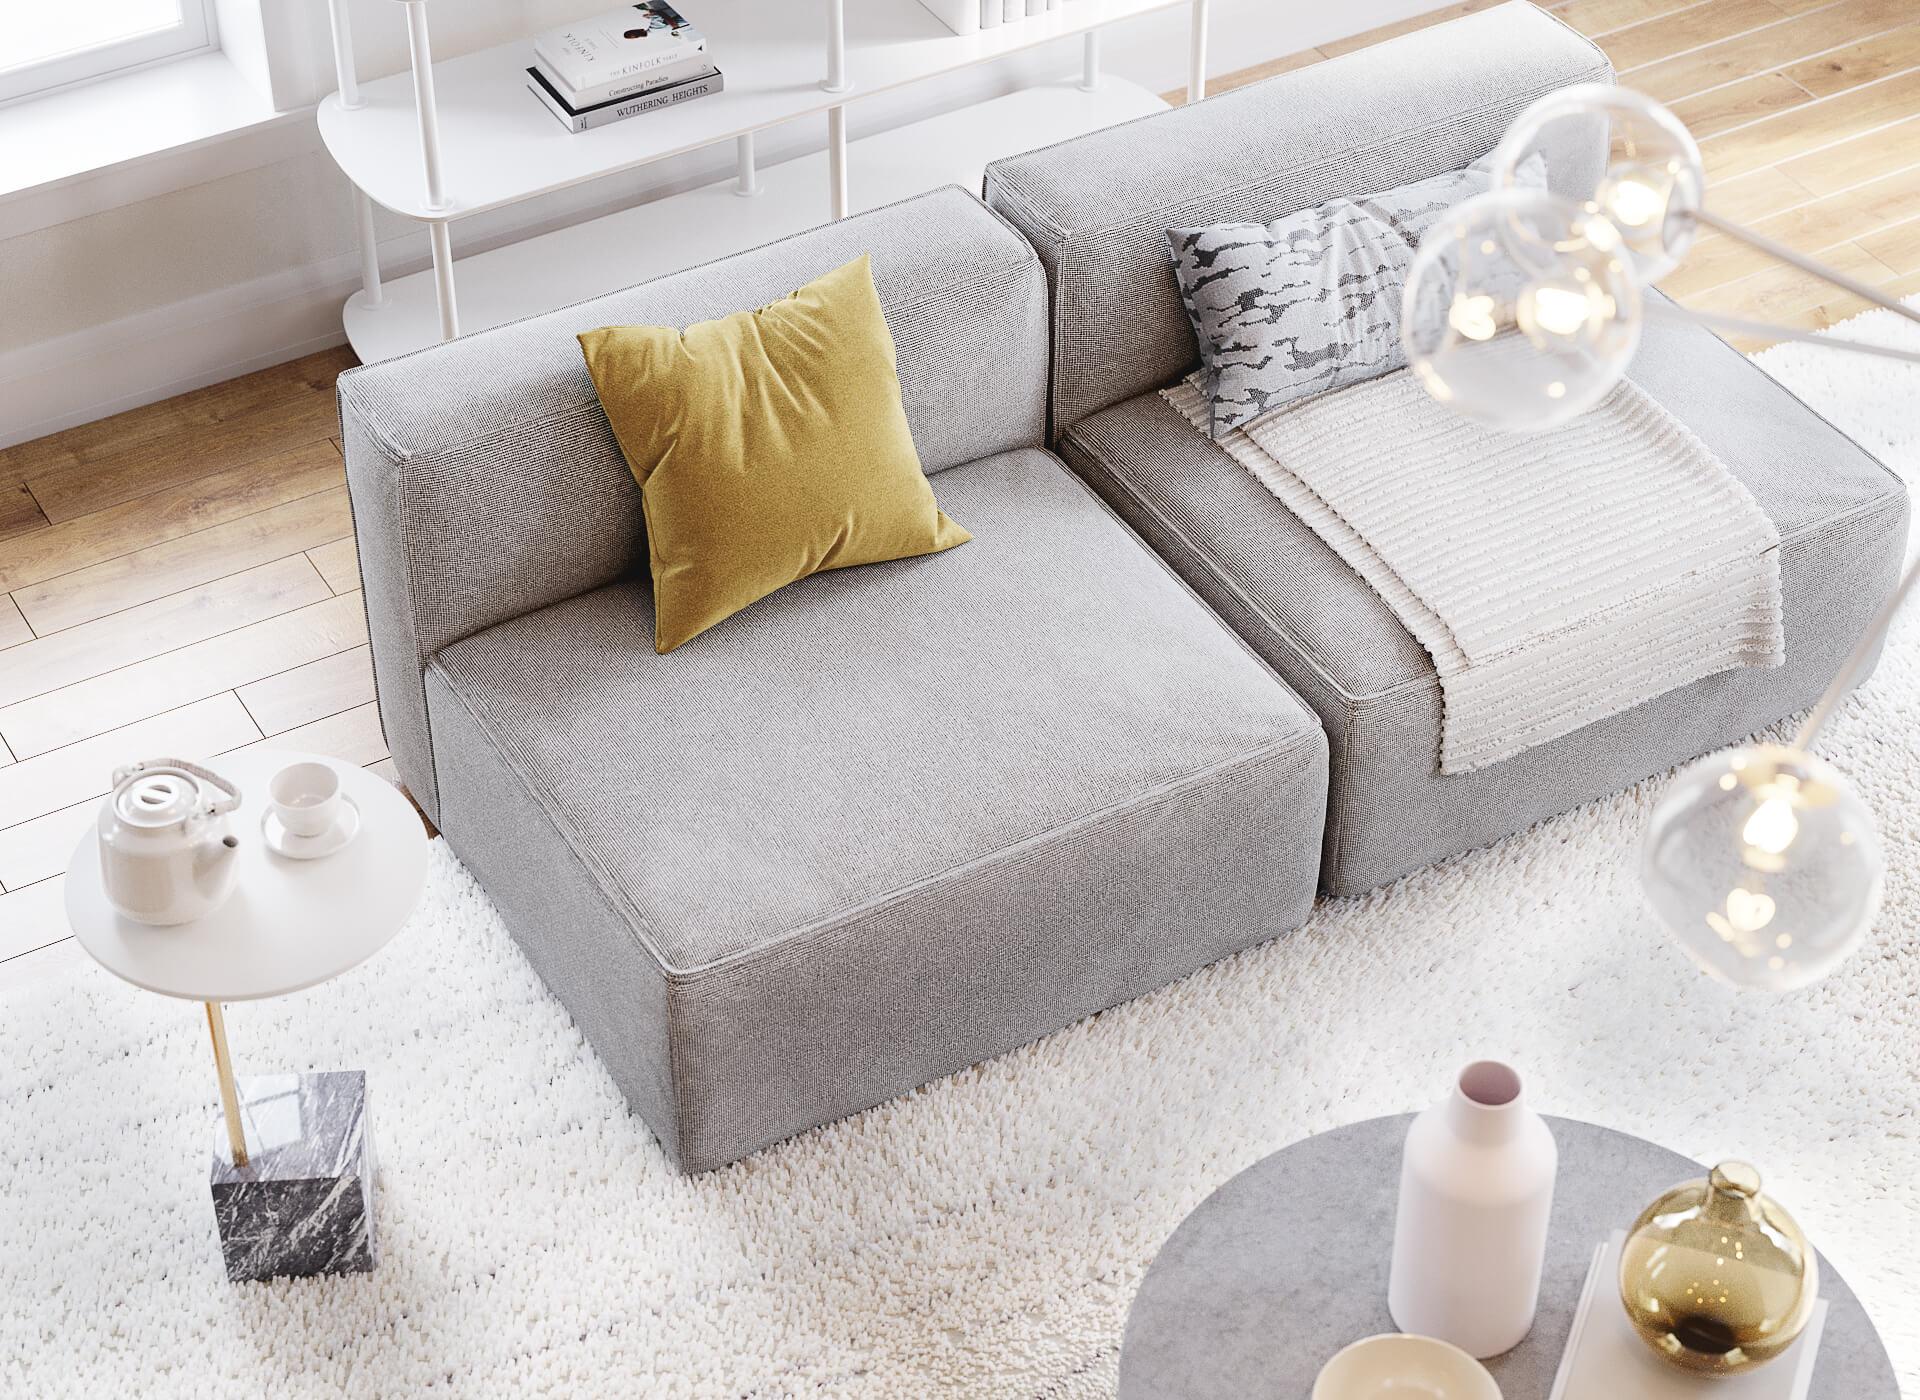 Sofa 3D Render in an Interior Scene